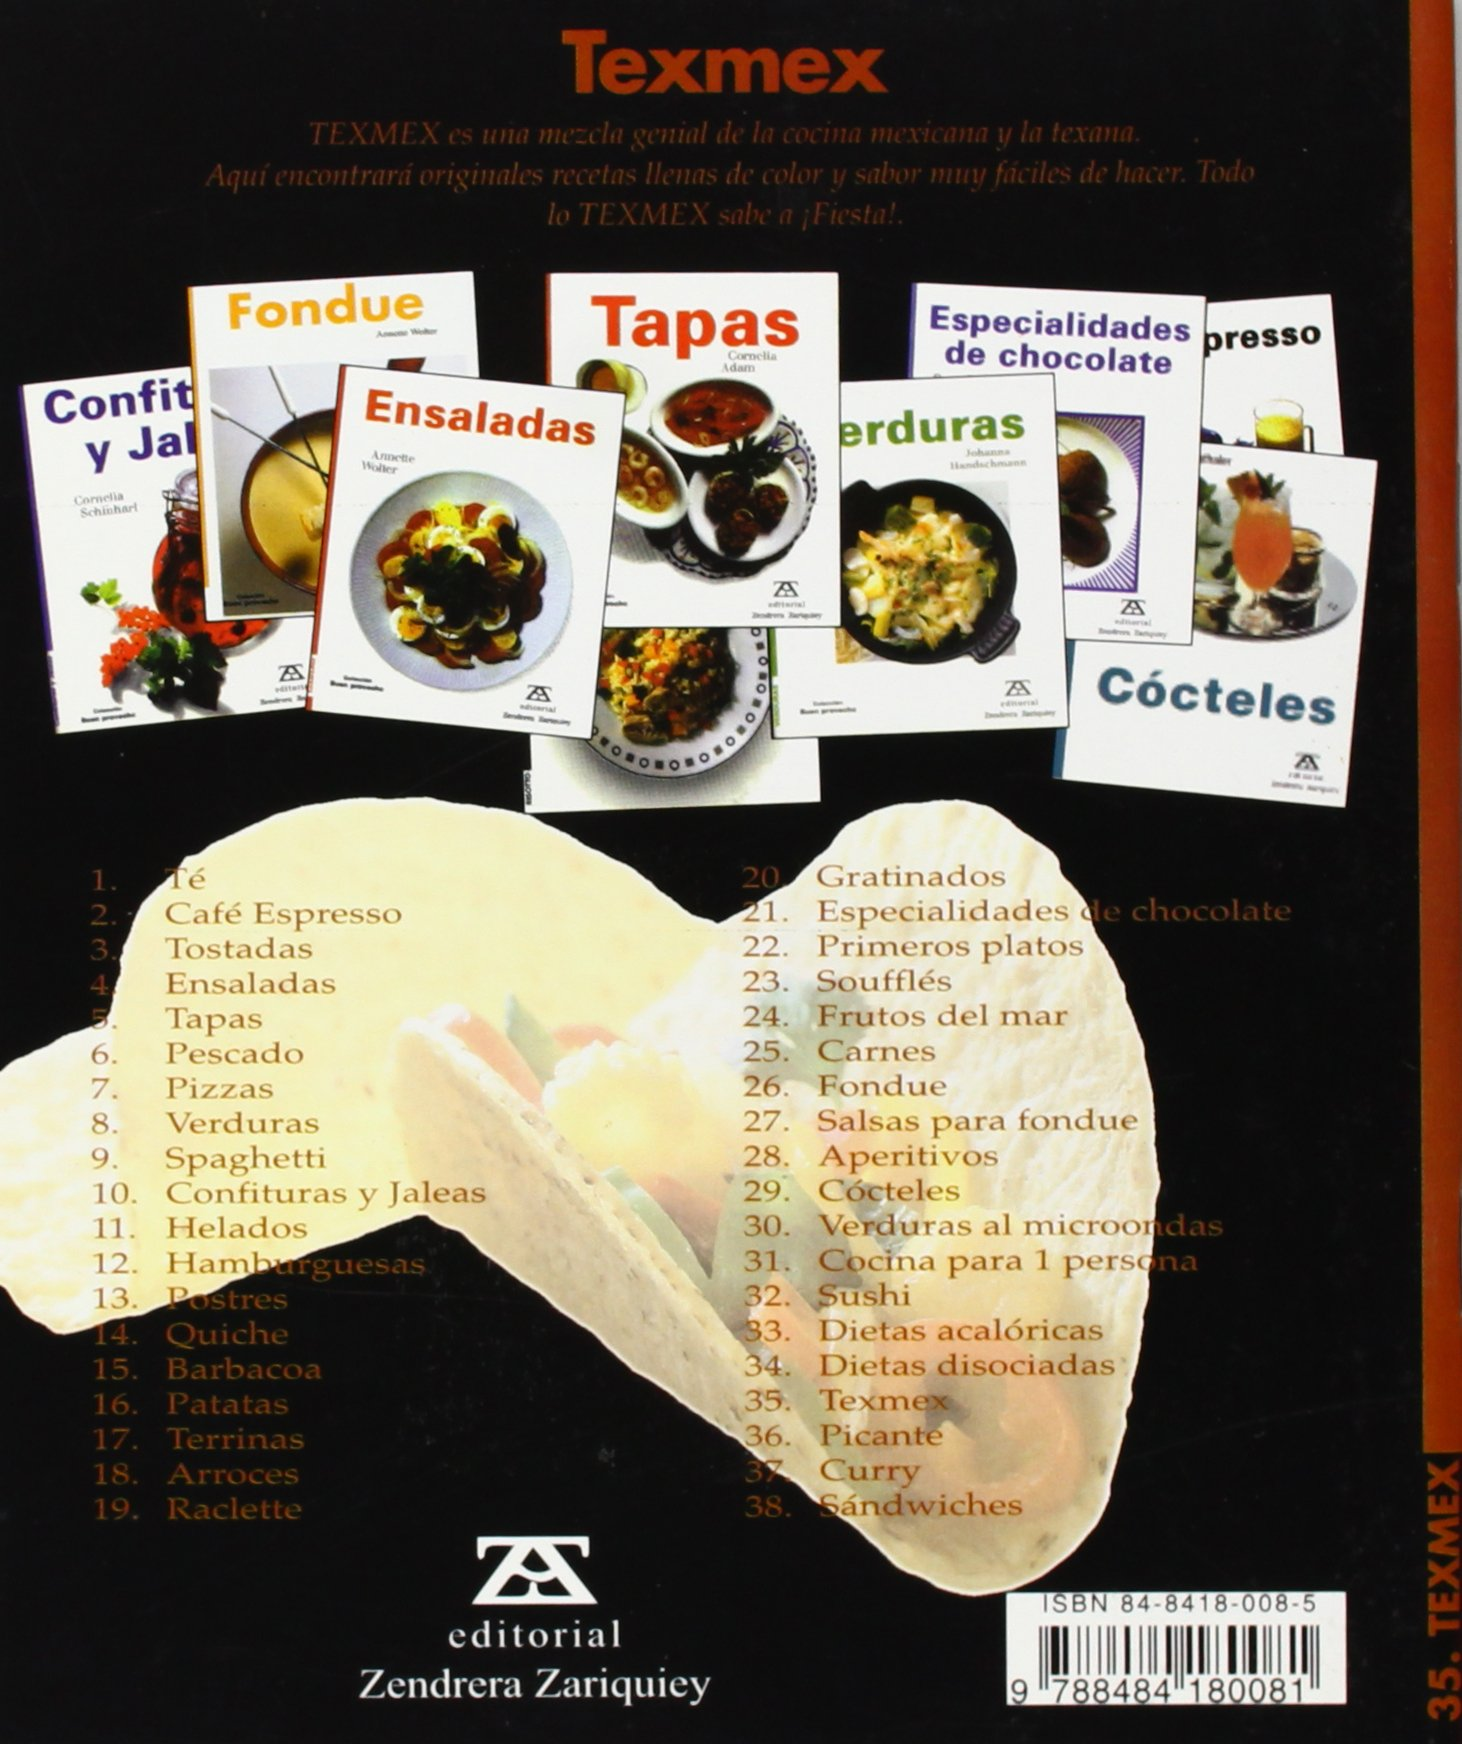 Texmex (Spanish Edition): Reinhardt Hess: 9788484180081: Amazon.com: Books